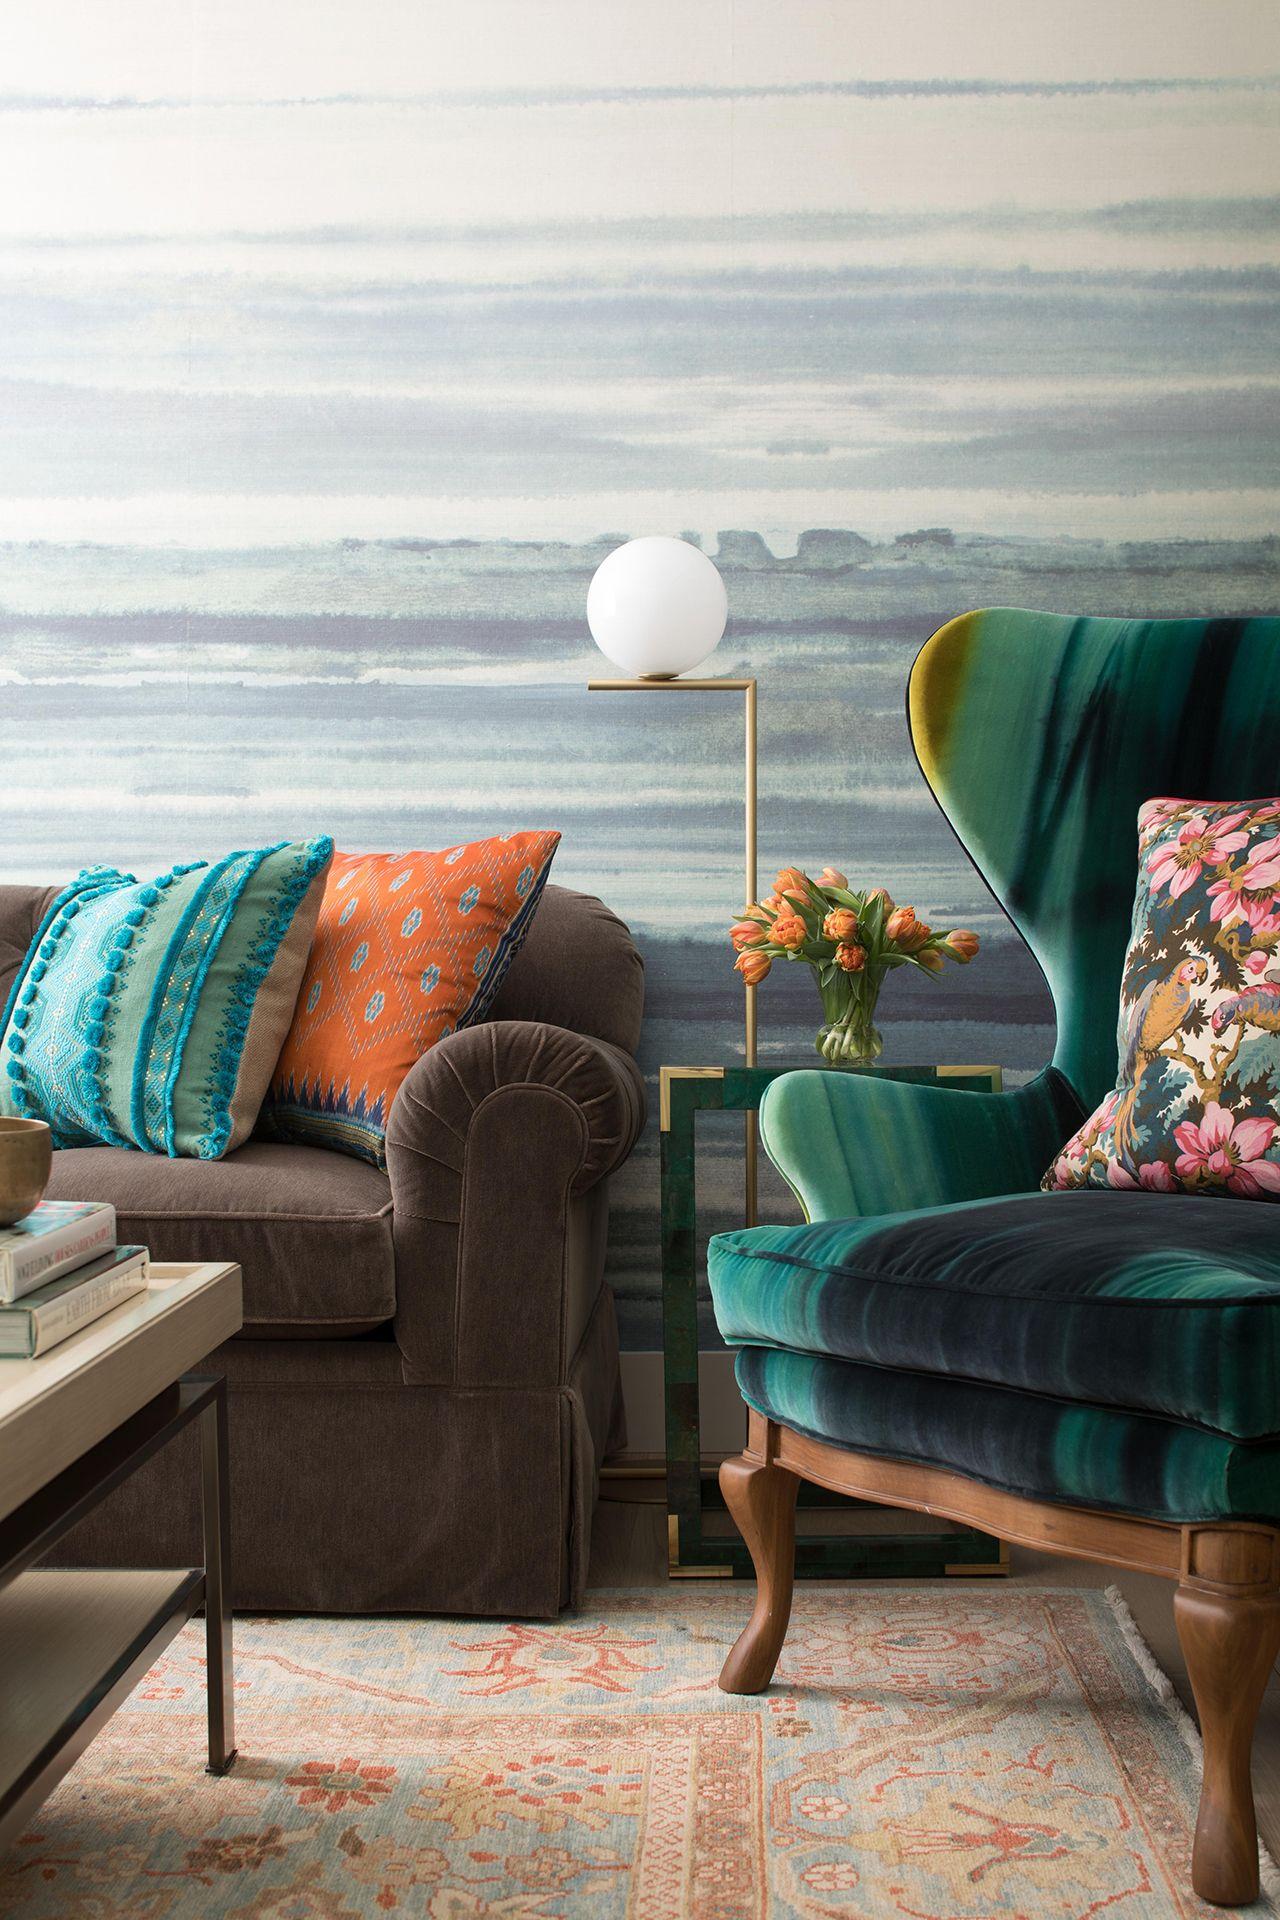 17 Stunning Ways To Decorate With A Brown Sofa Brown Sofa Li